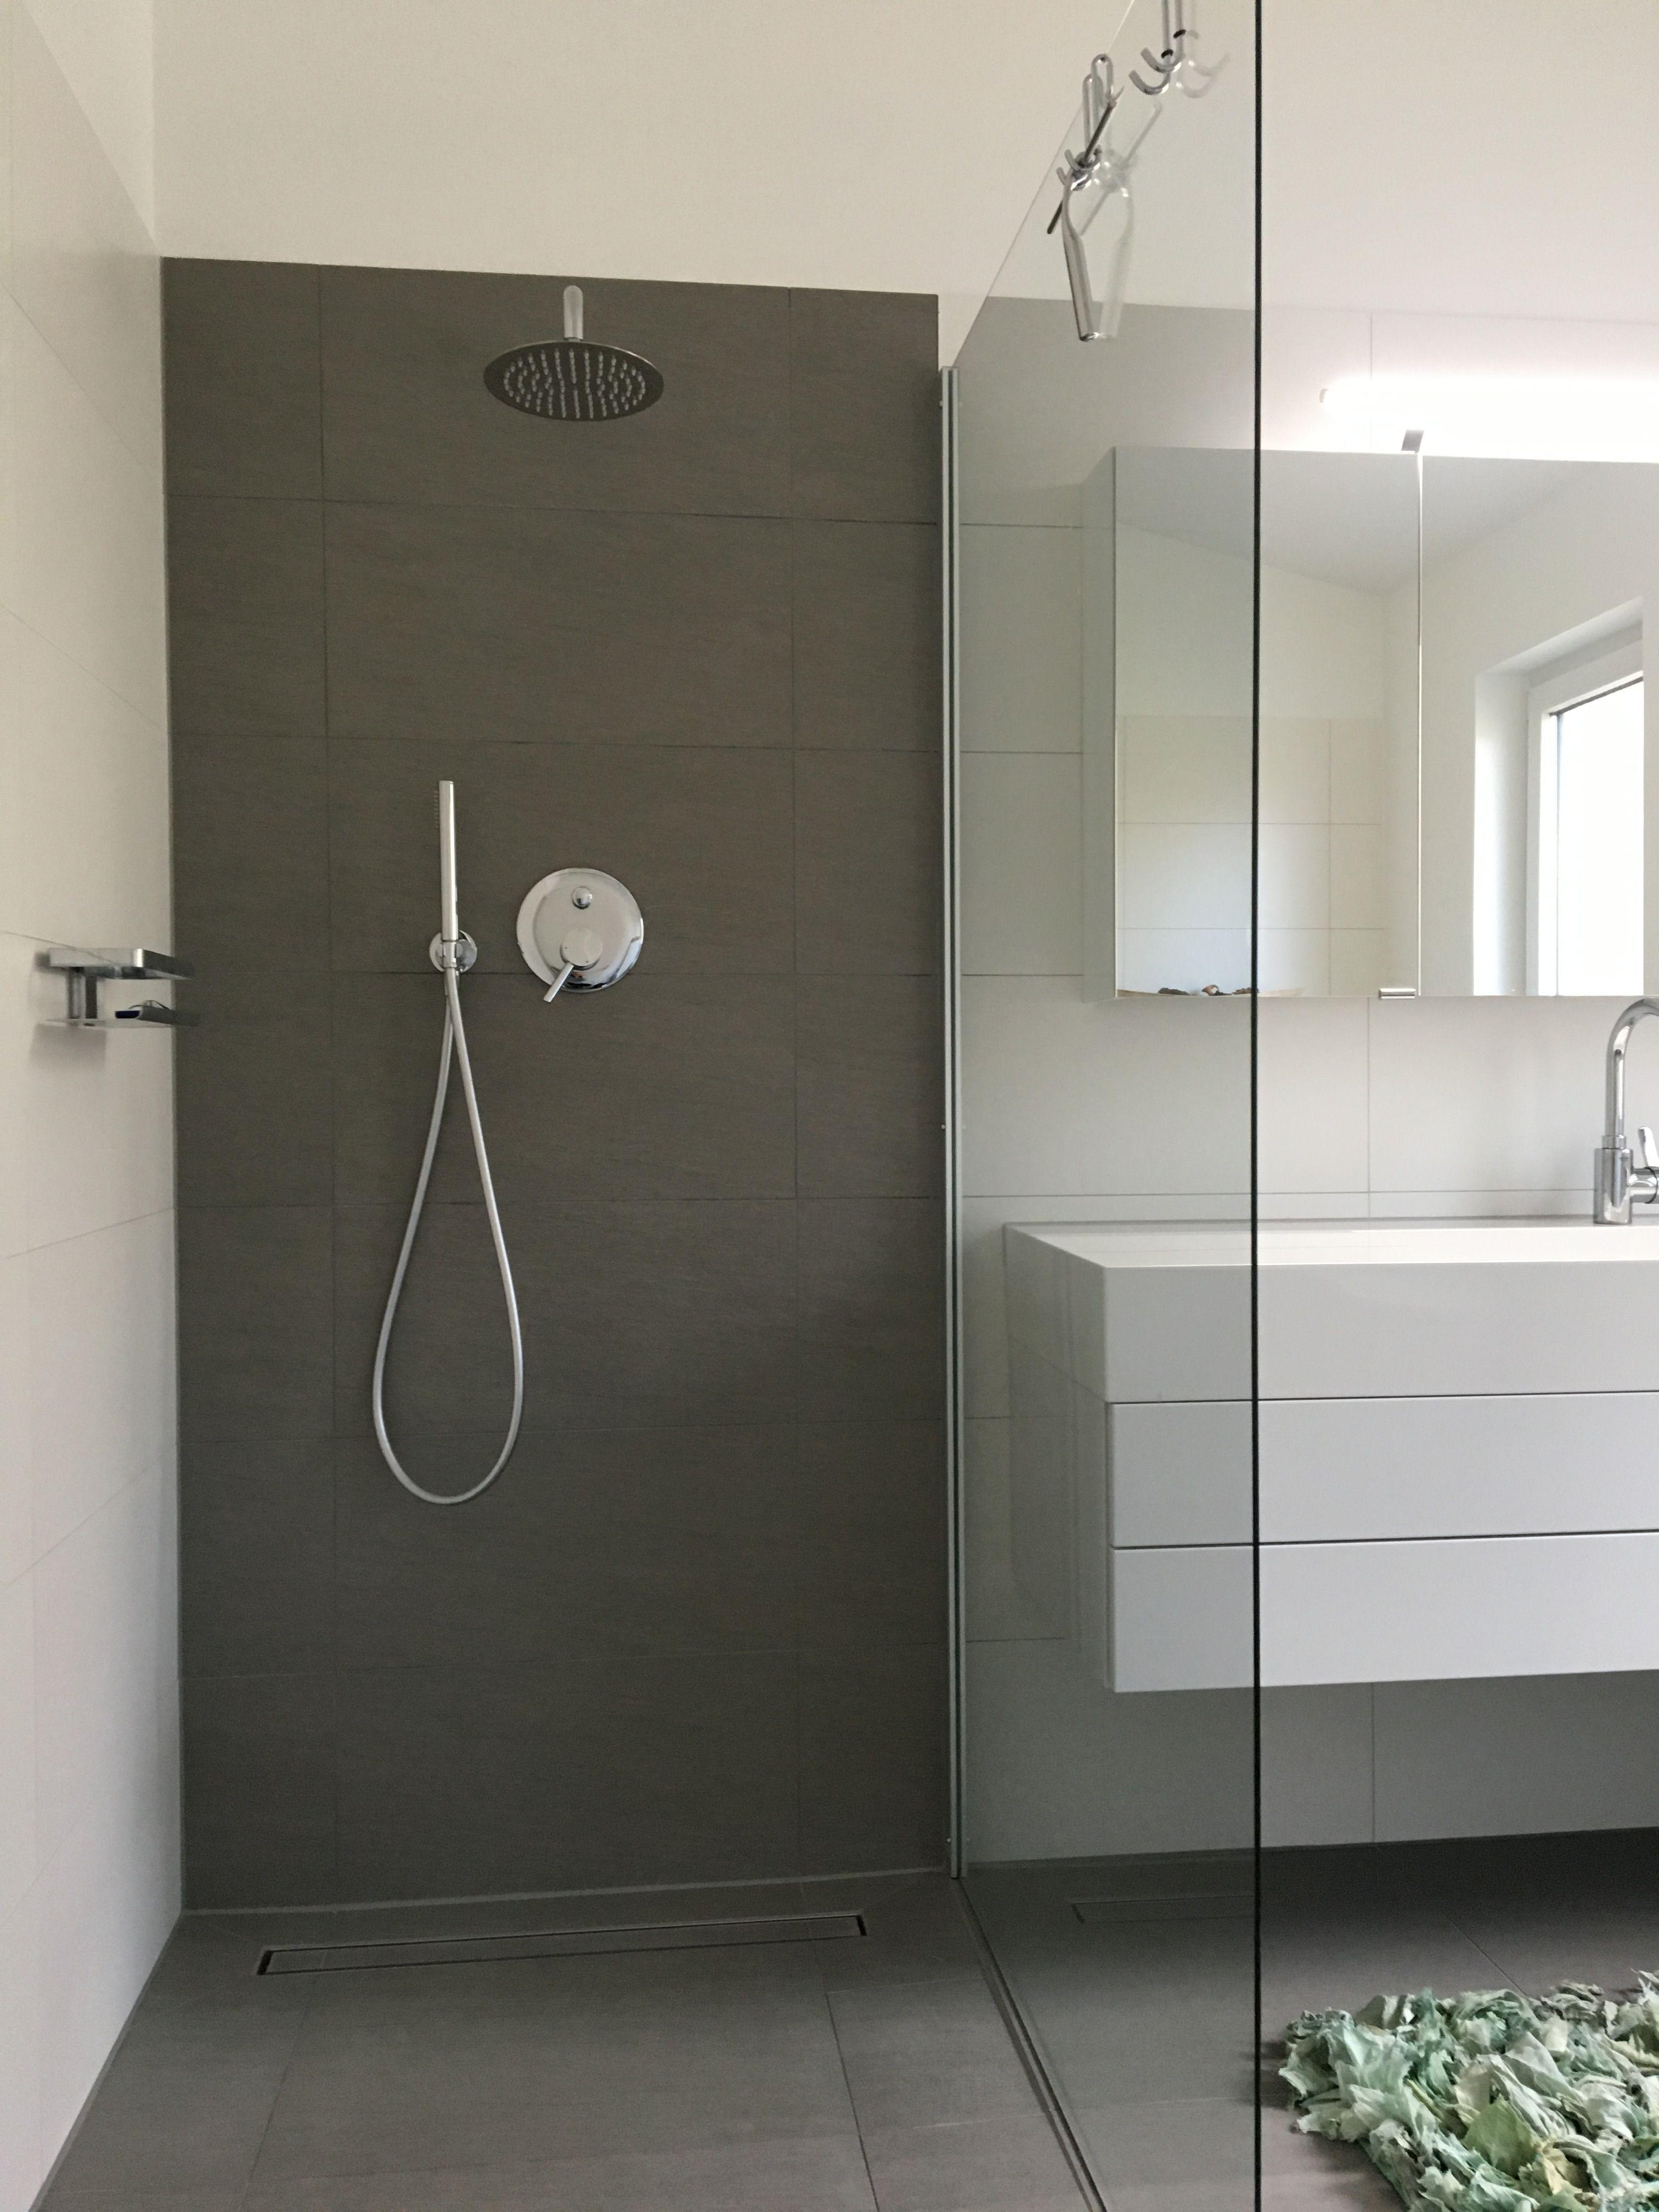 Badezimmer Dusche Fliesen Wasseranschluss Hinter Der Wand Glaswand 1m X 1 20m Begehbare Dusche Badezimmer Dusche Fliesen Dusche Fliesen Badezimmer